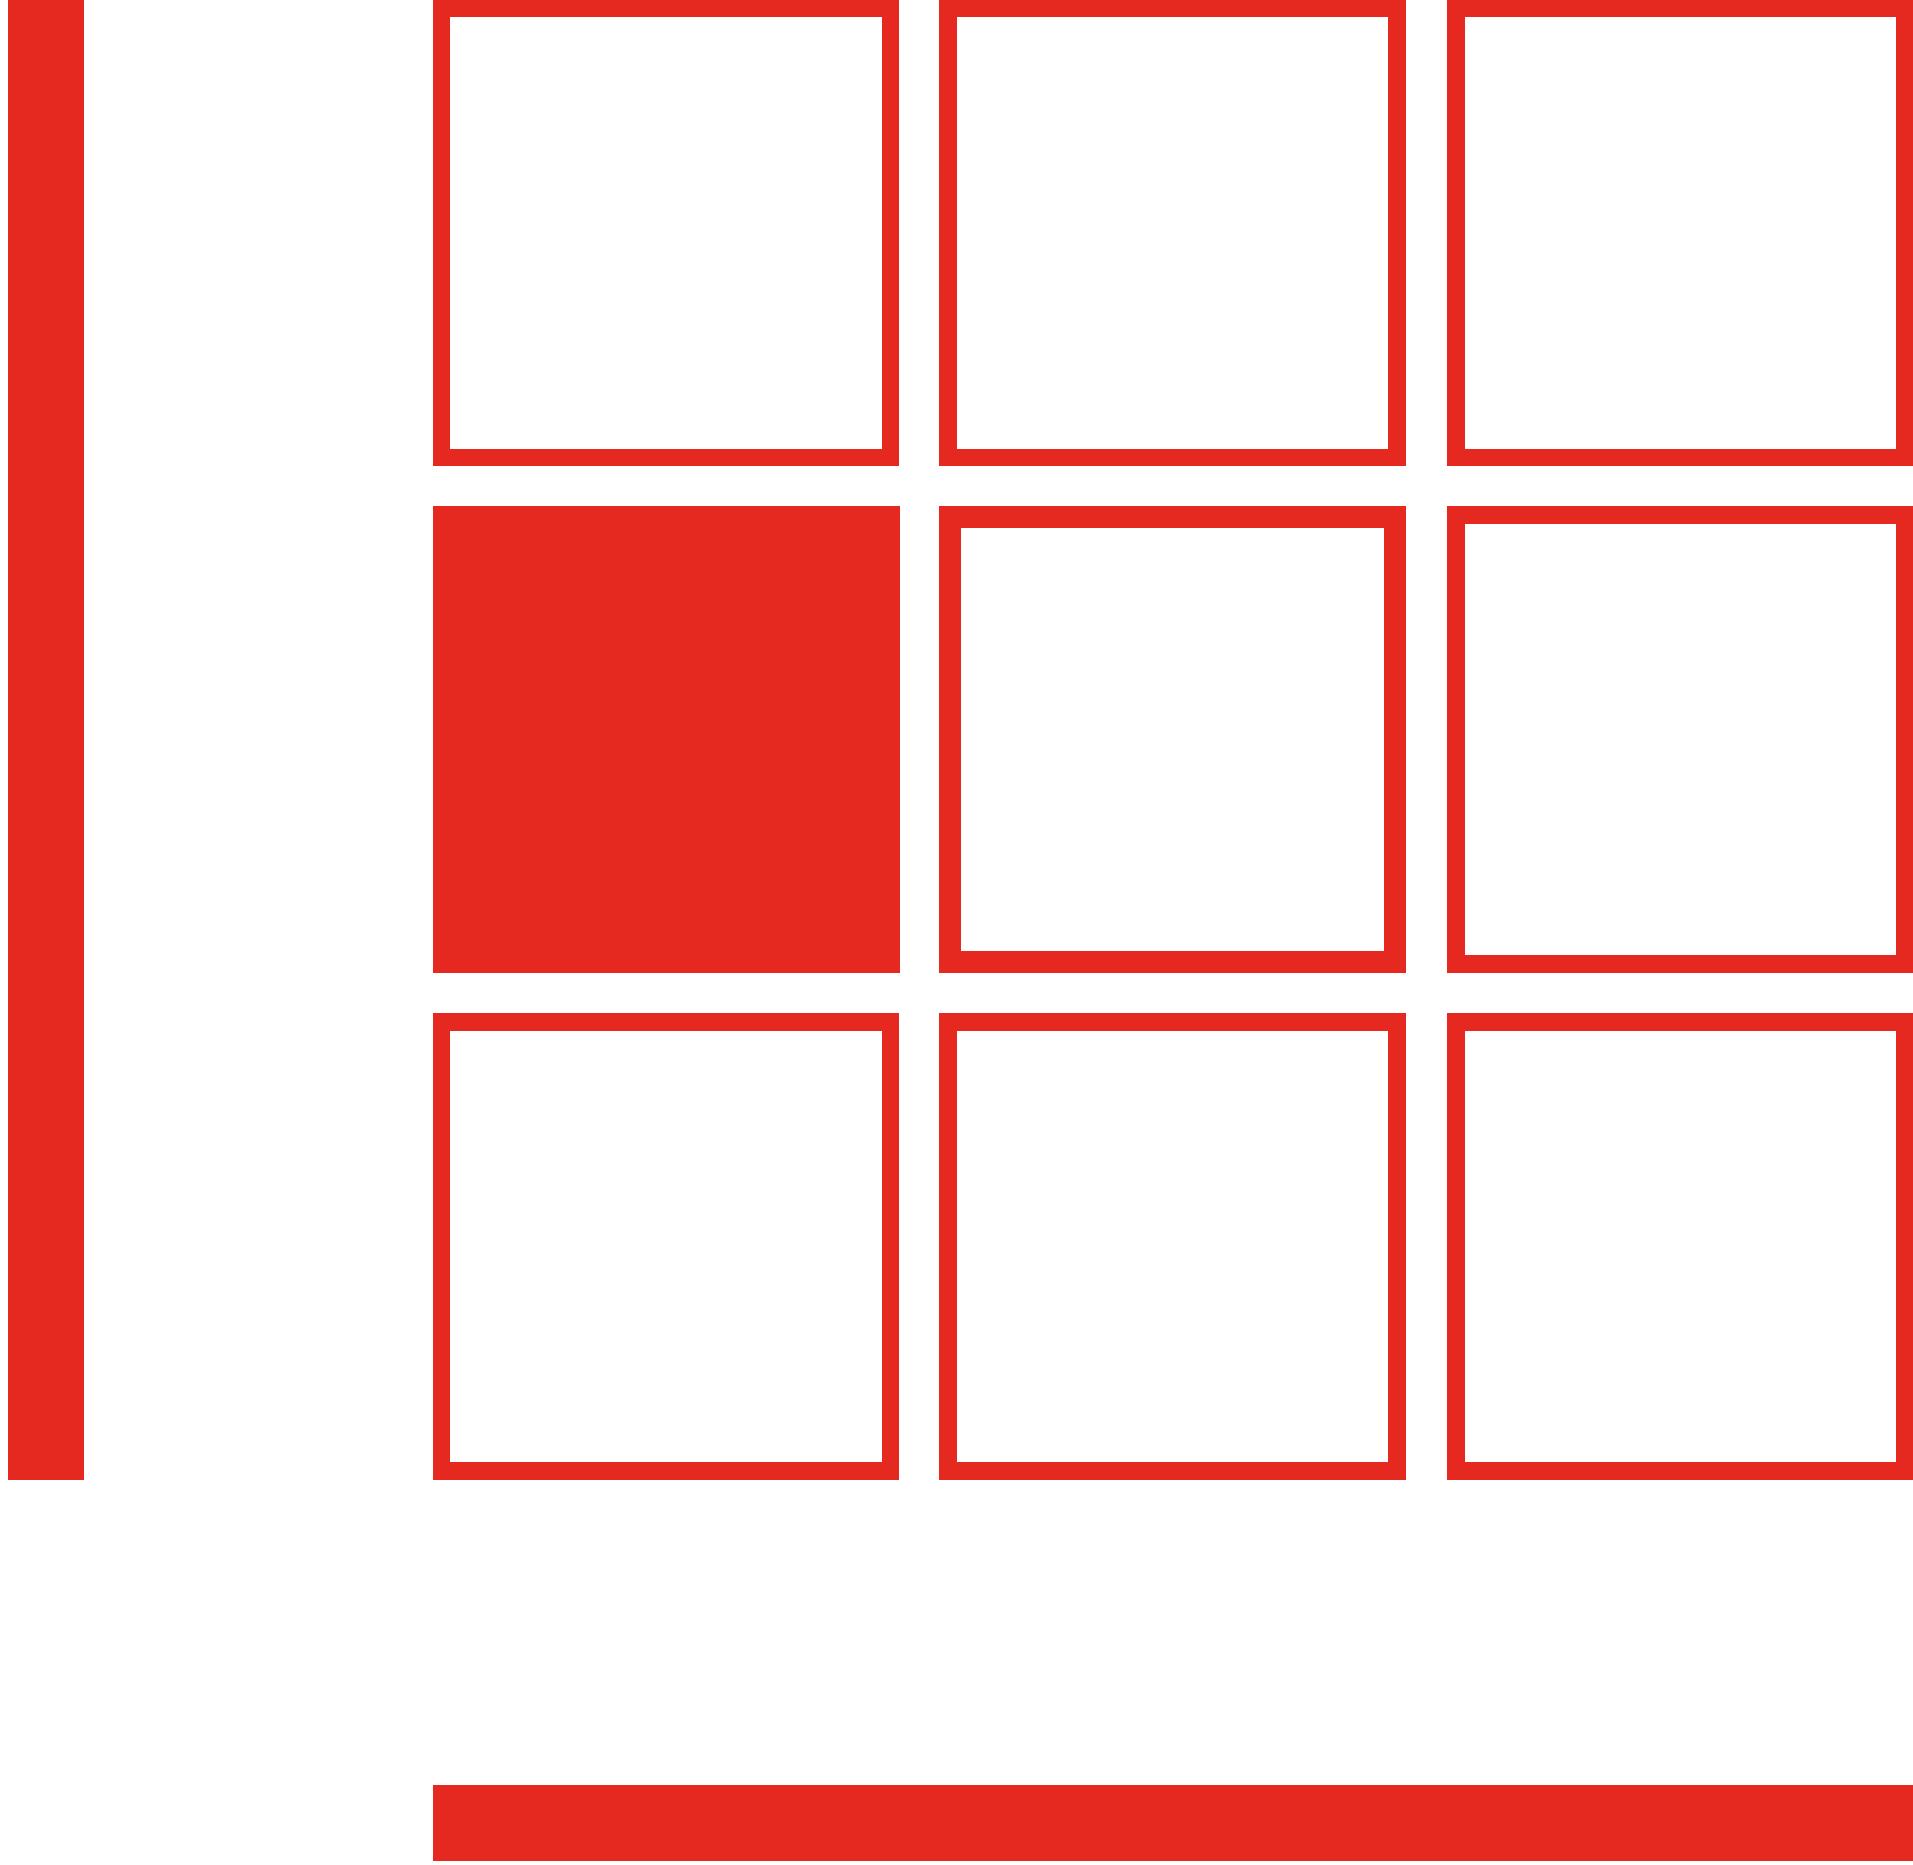 8x8-microsite-maturity-reports-matrix-4-cover.png